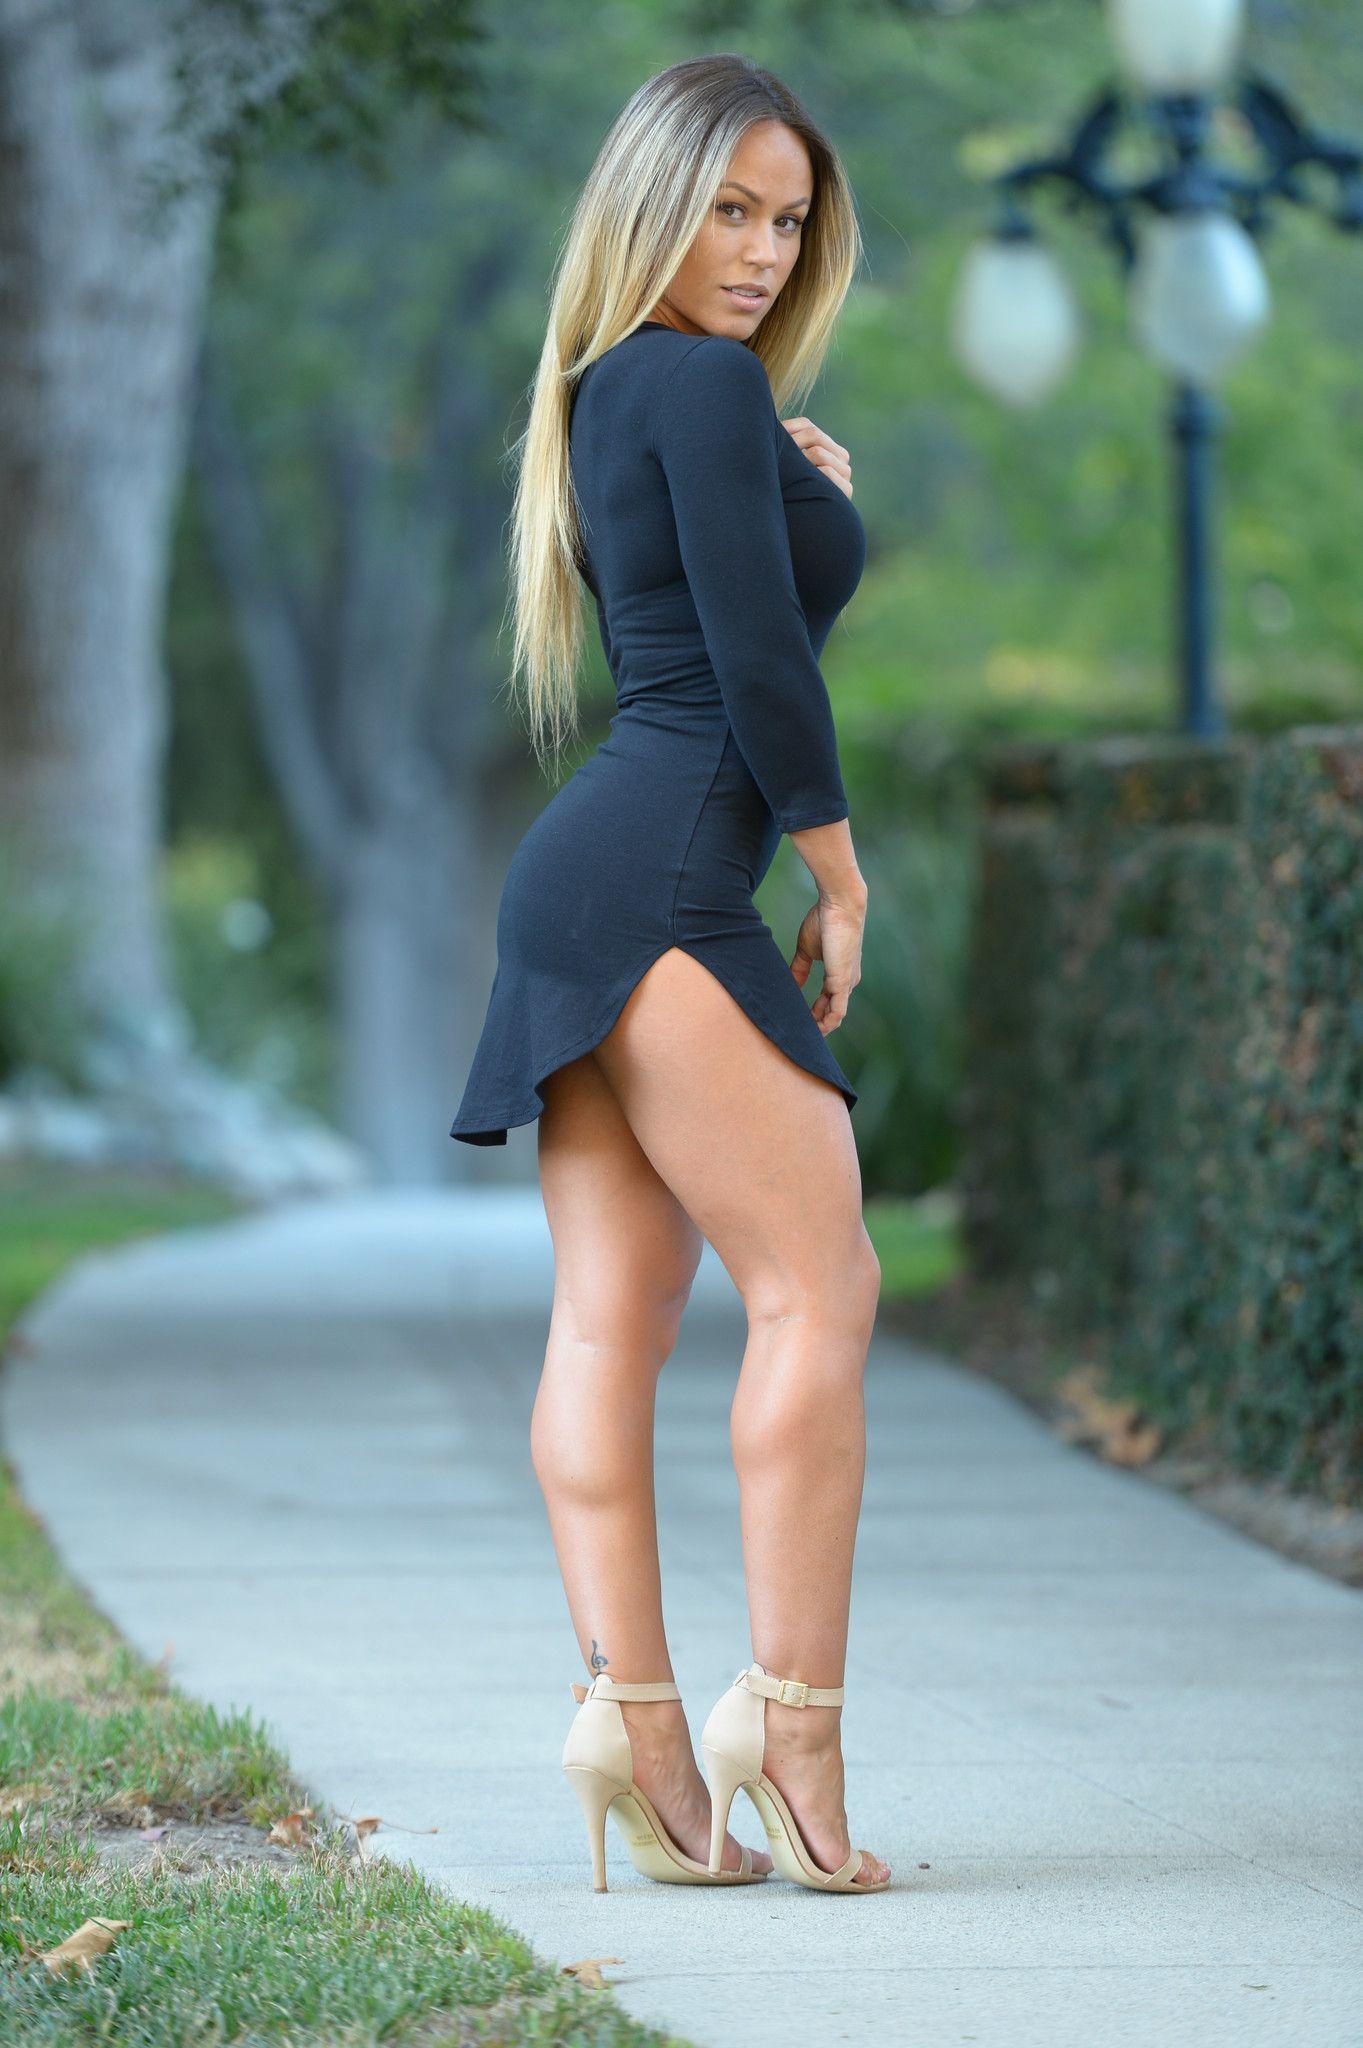 beyonce-sexy-short-skirts